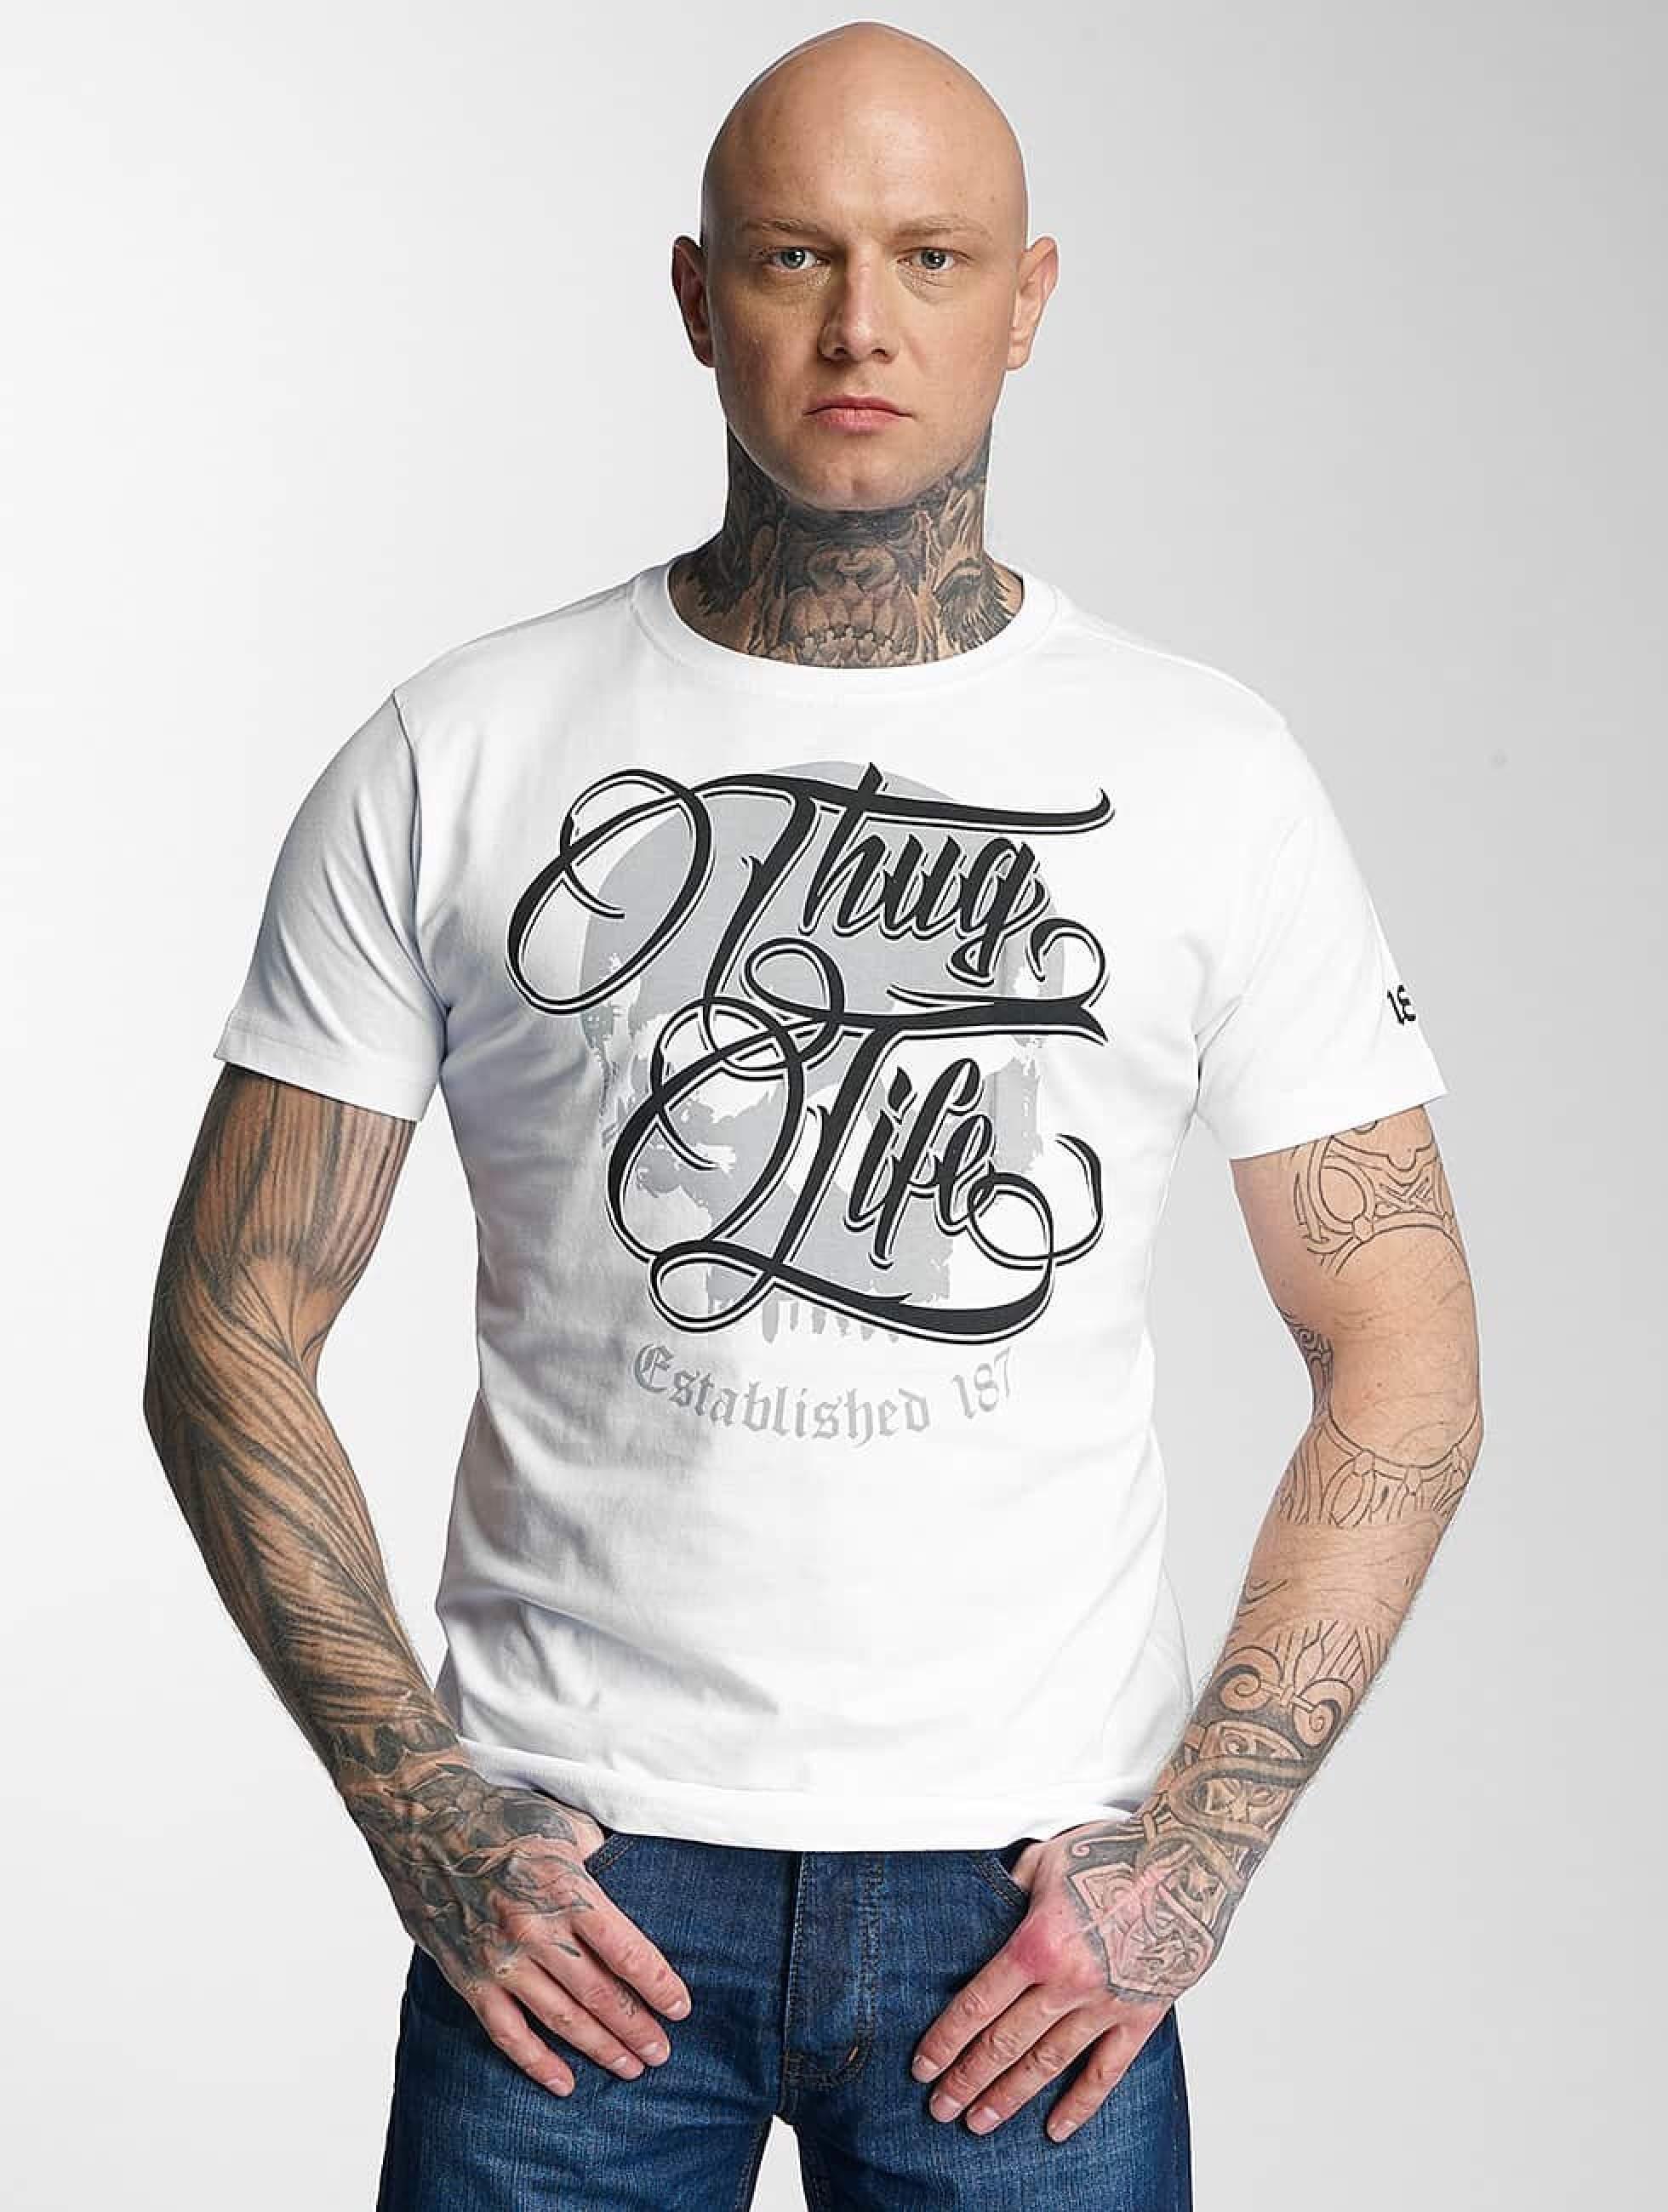 Thug Life / T-Shirt 187 in white S